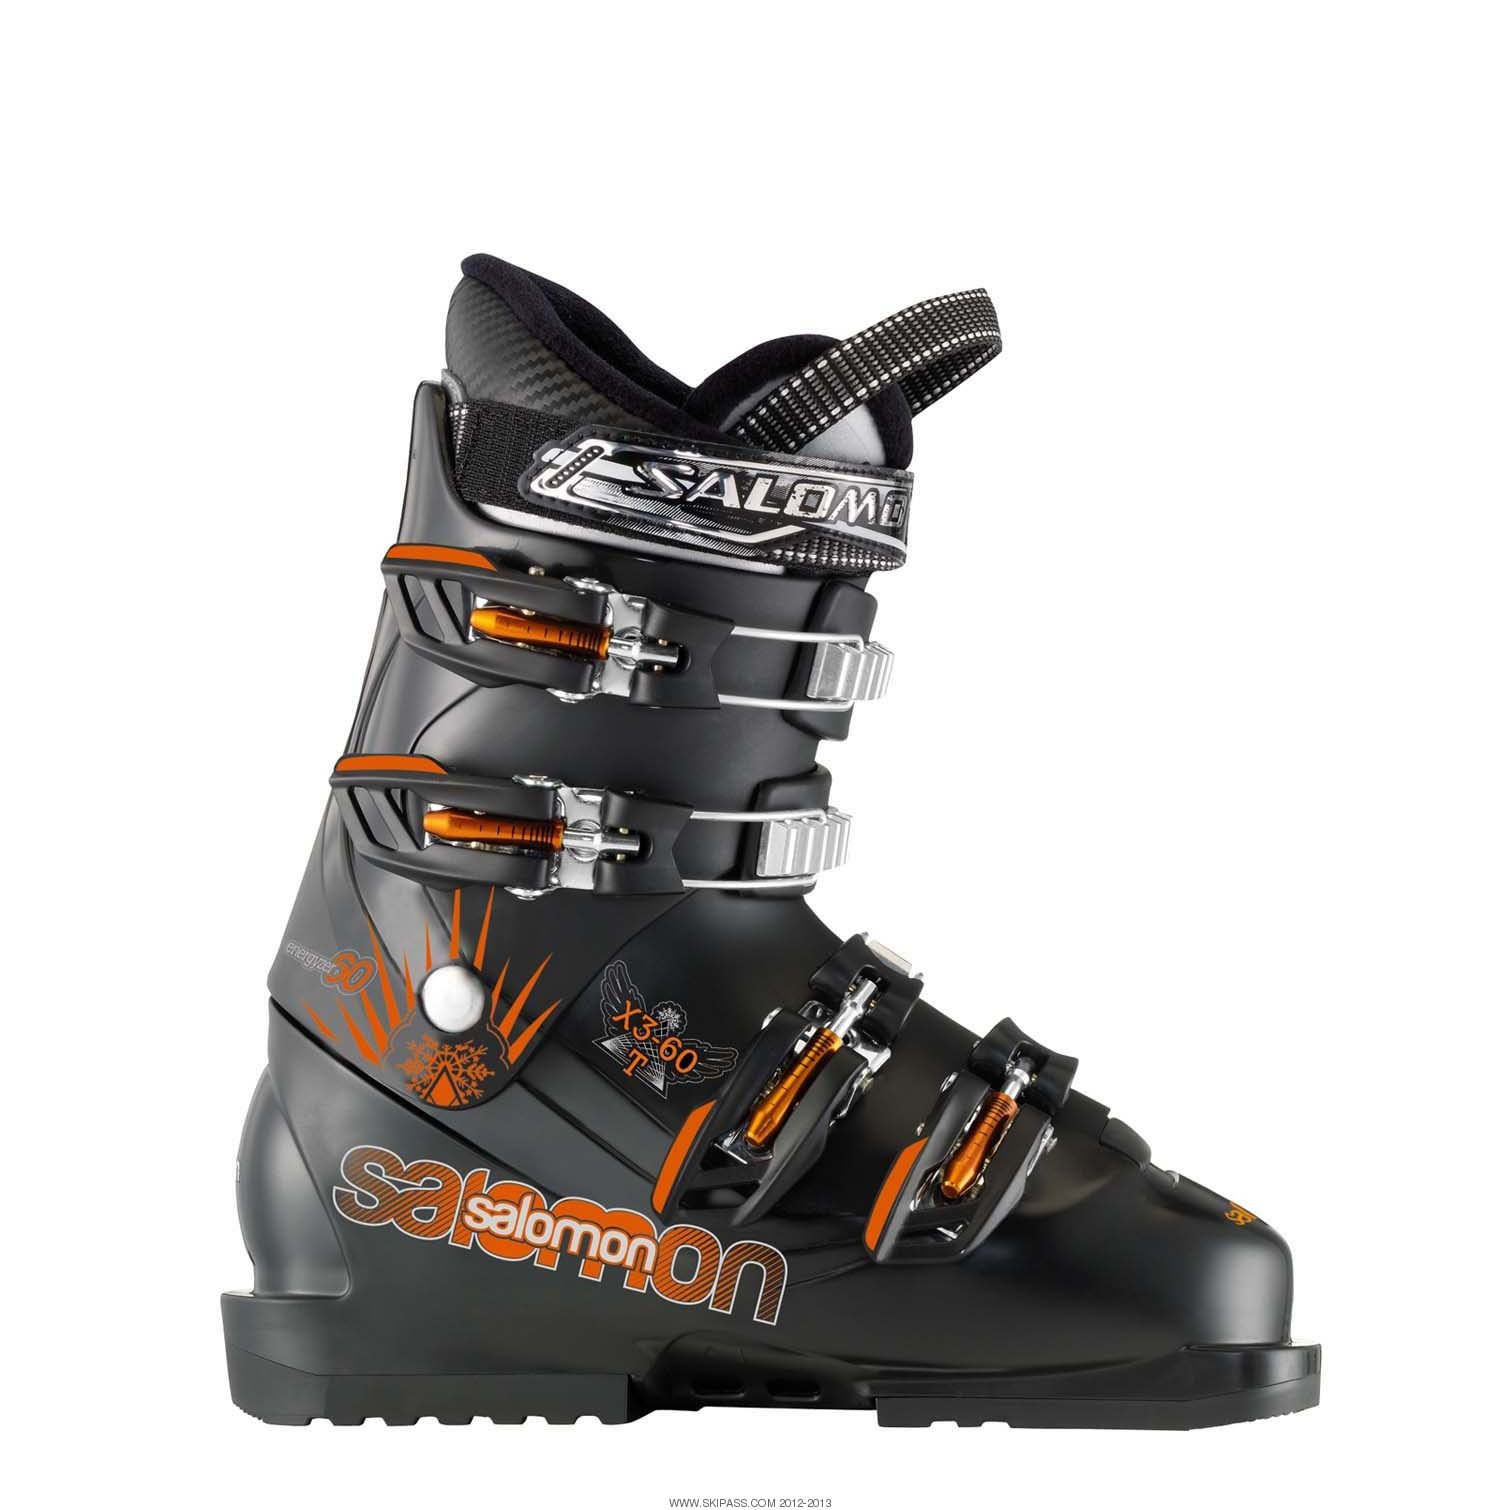 Test chaussures de ski Salomon X3 60 T, chaussures ski